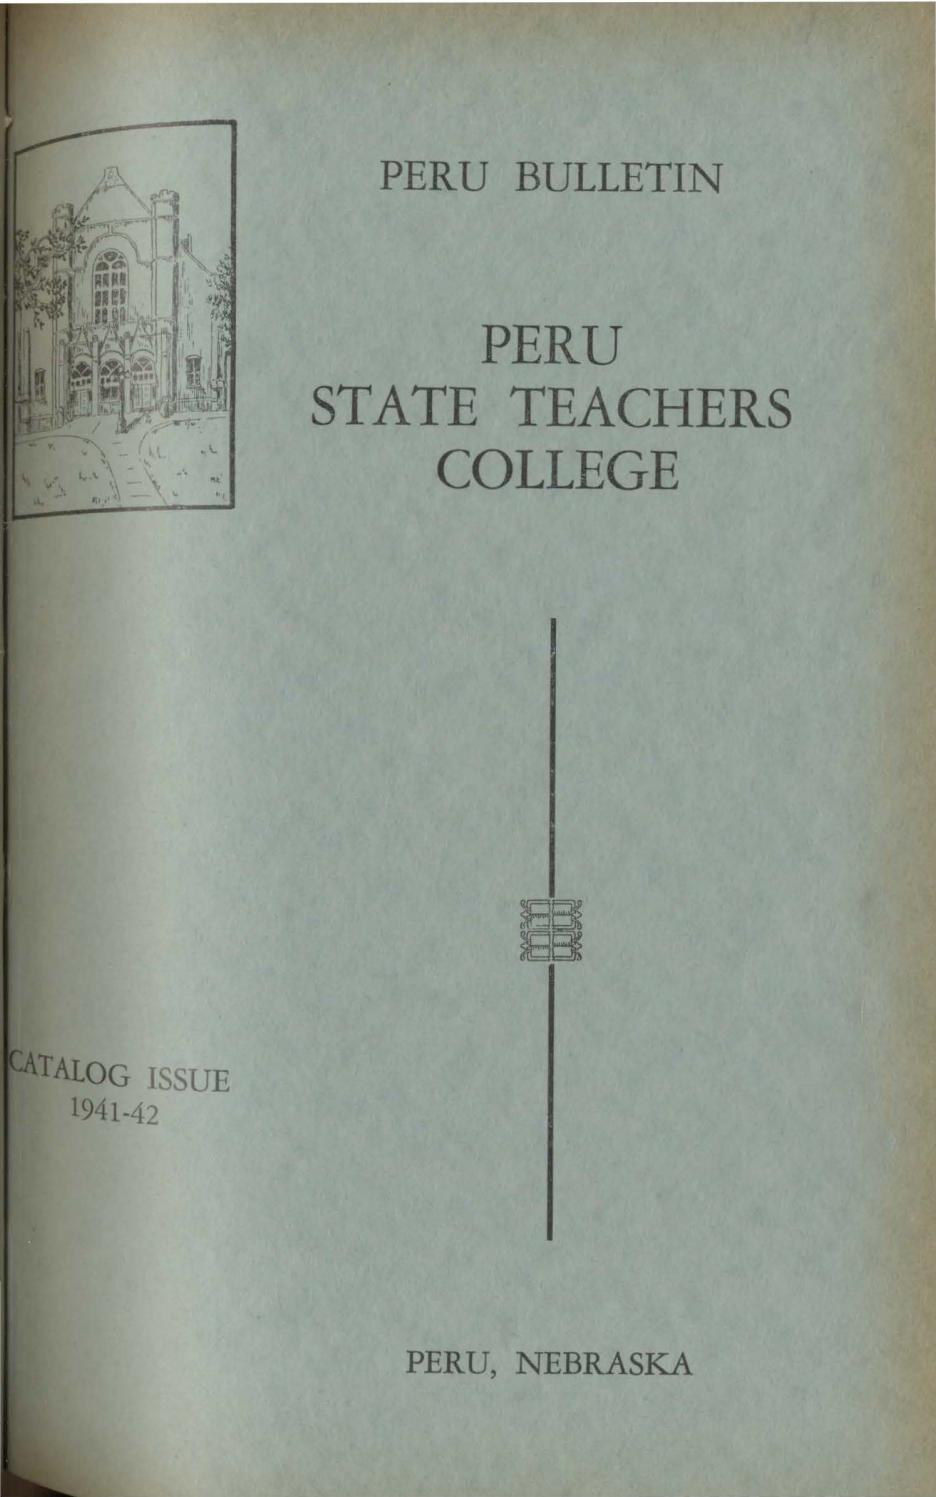 1941-1942 Catalog of Peru State Teachers College (Neska ... on